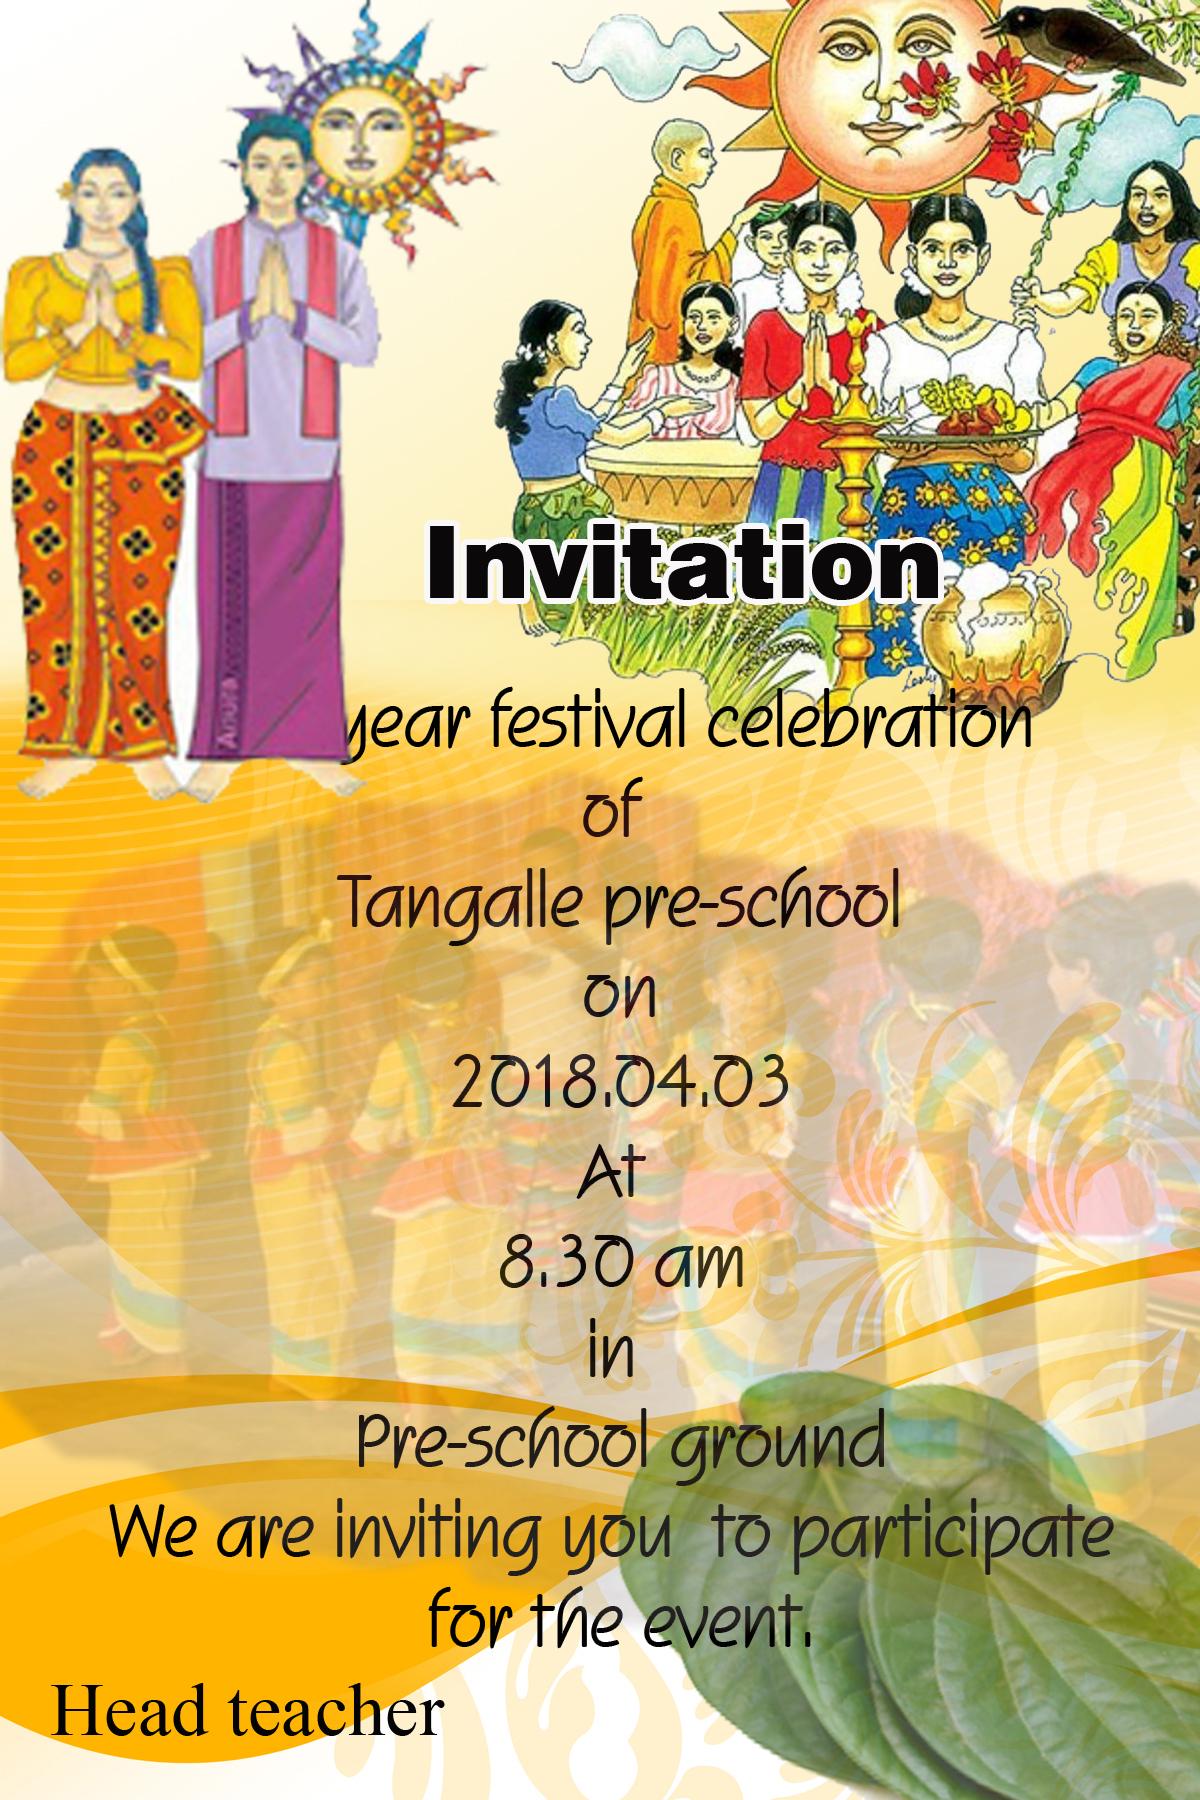 Invitation To Palathuduwa Preschool S New Year Celebration